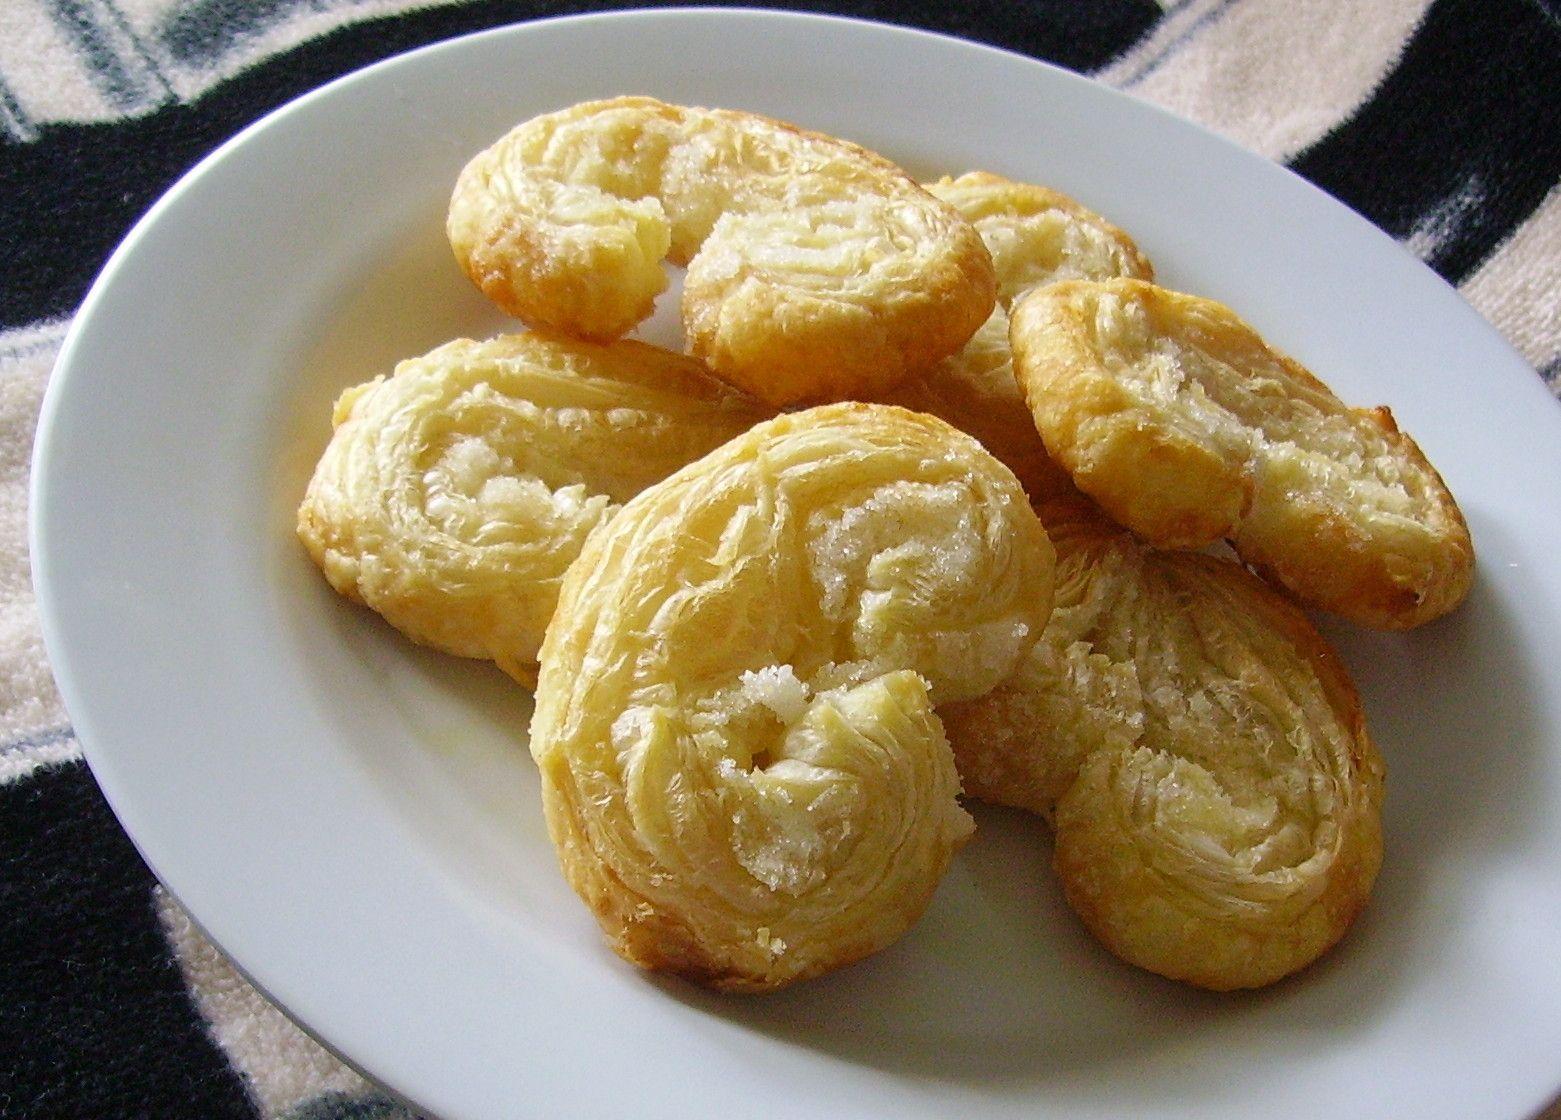 12 Easy Two-Ingredient Dessert Recipes - Allrecipes | Food